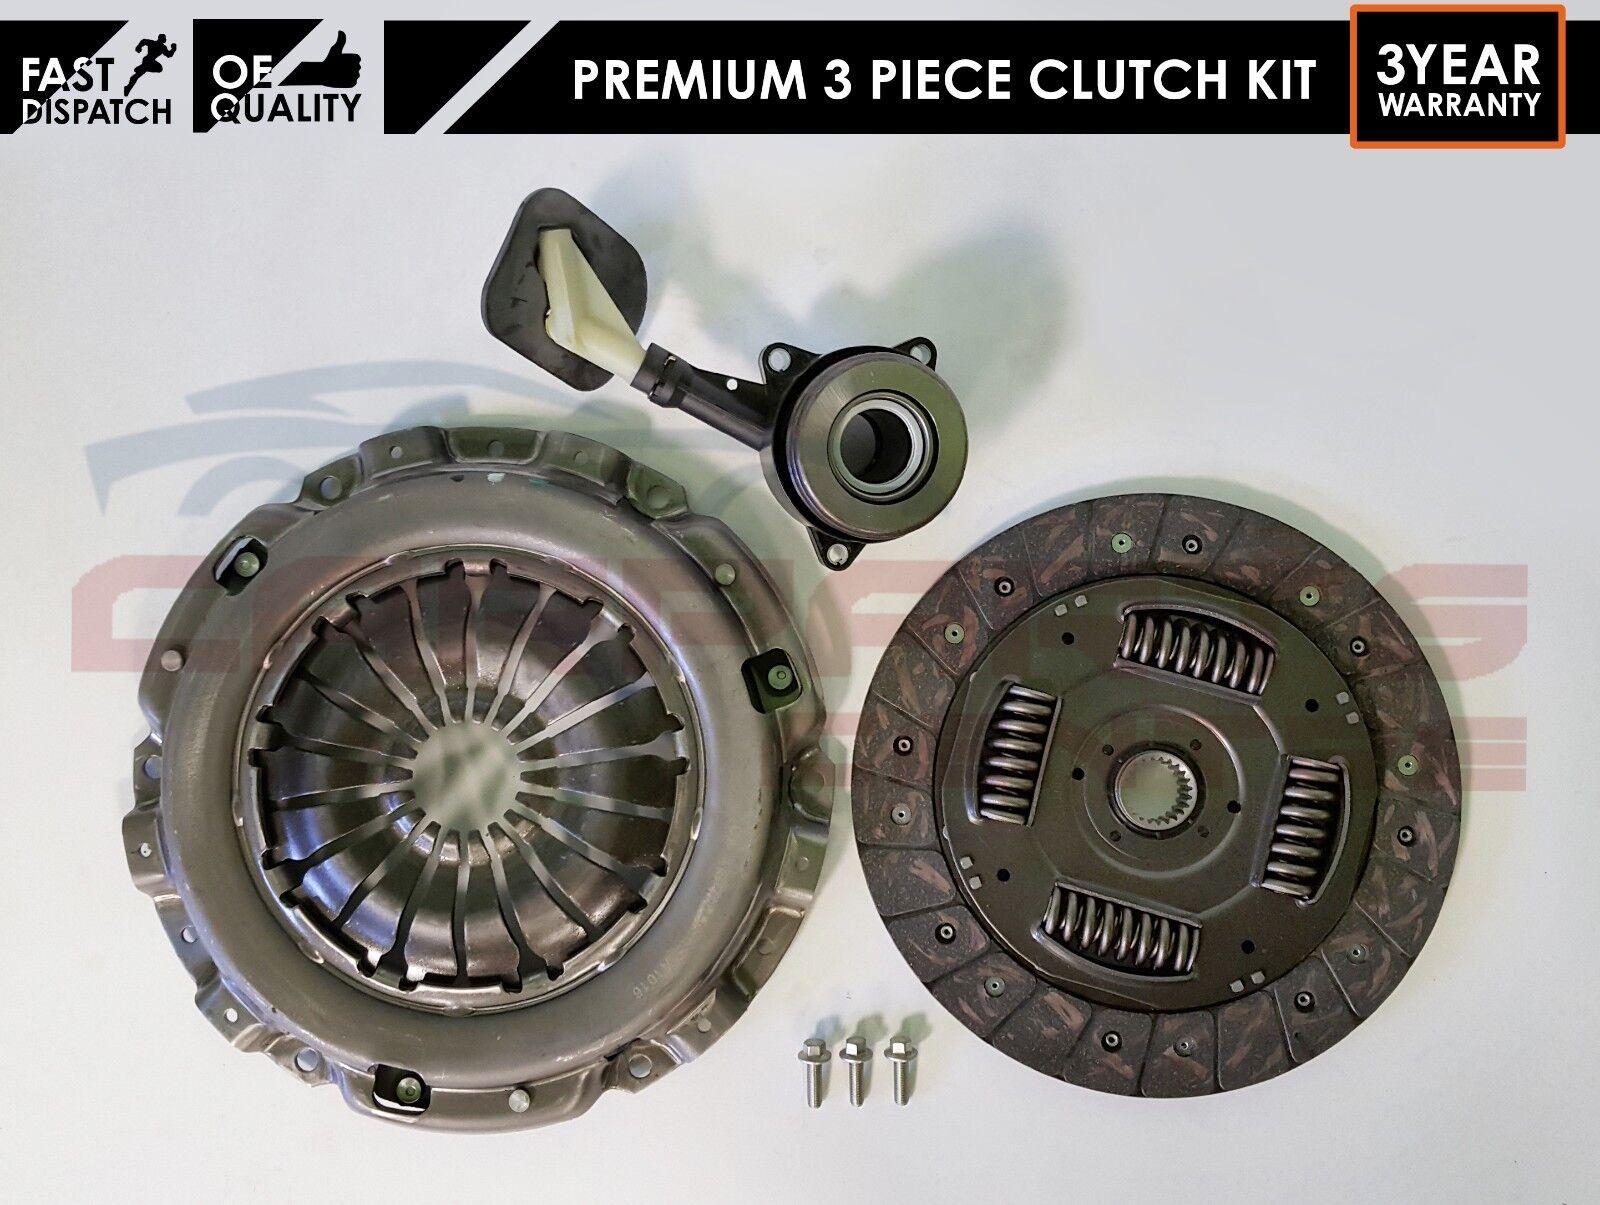 For Vauxhall Insignia 2 0 Cdti Dual Mass Flywheel  U0026 Clutch Kit A20dth 160hp